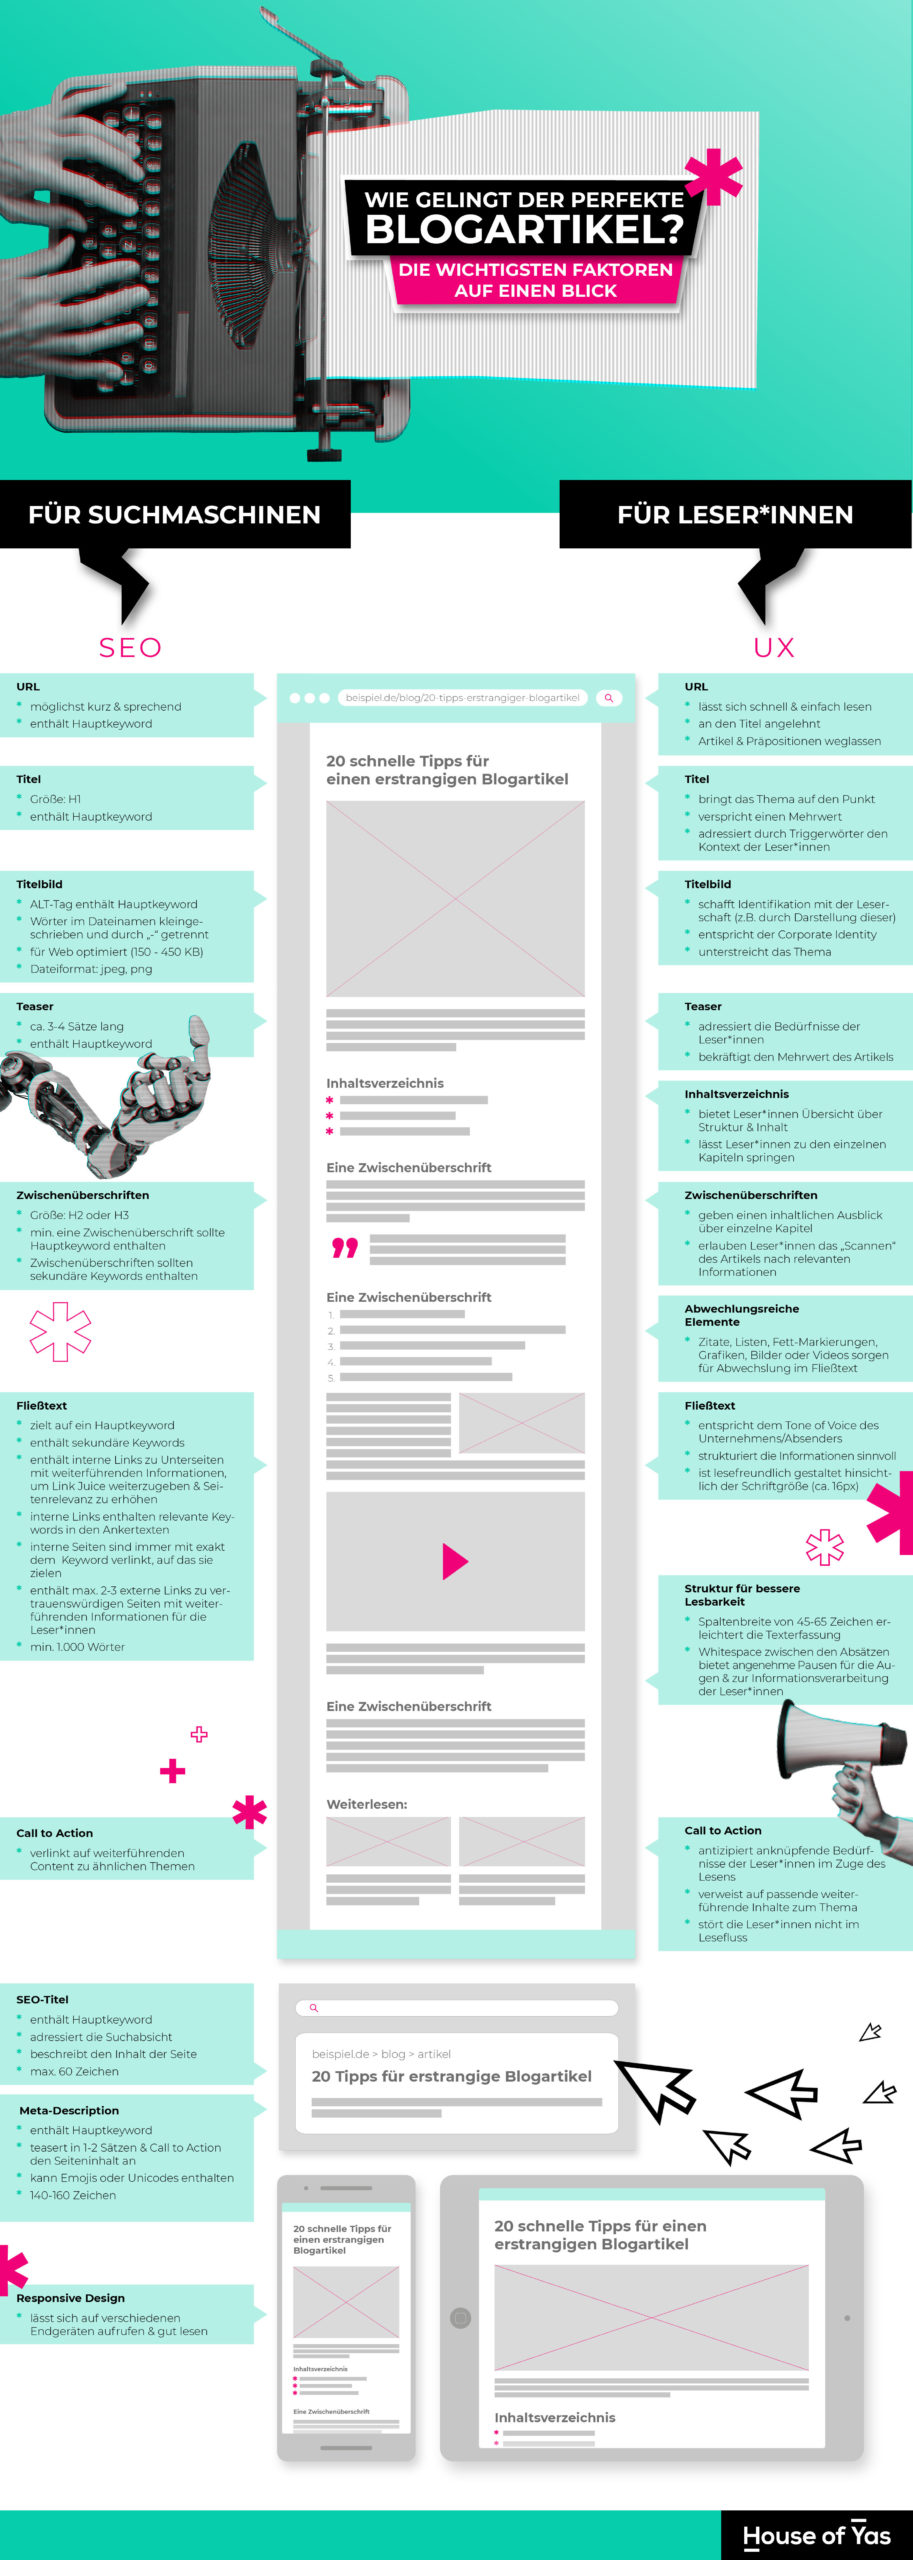 Infografik Perfekten Blogpost schreiben